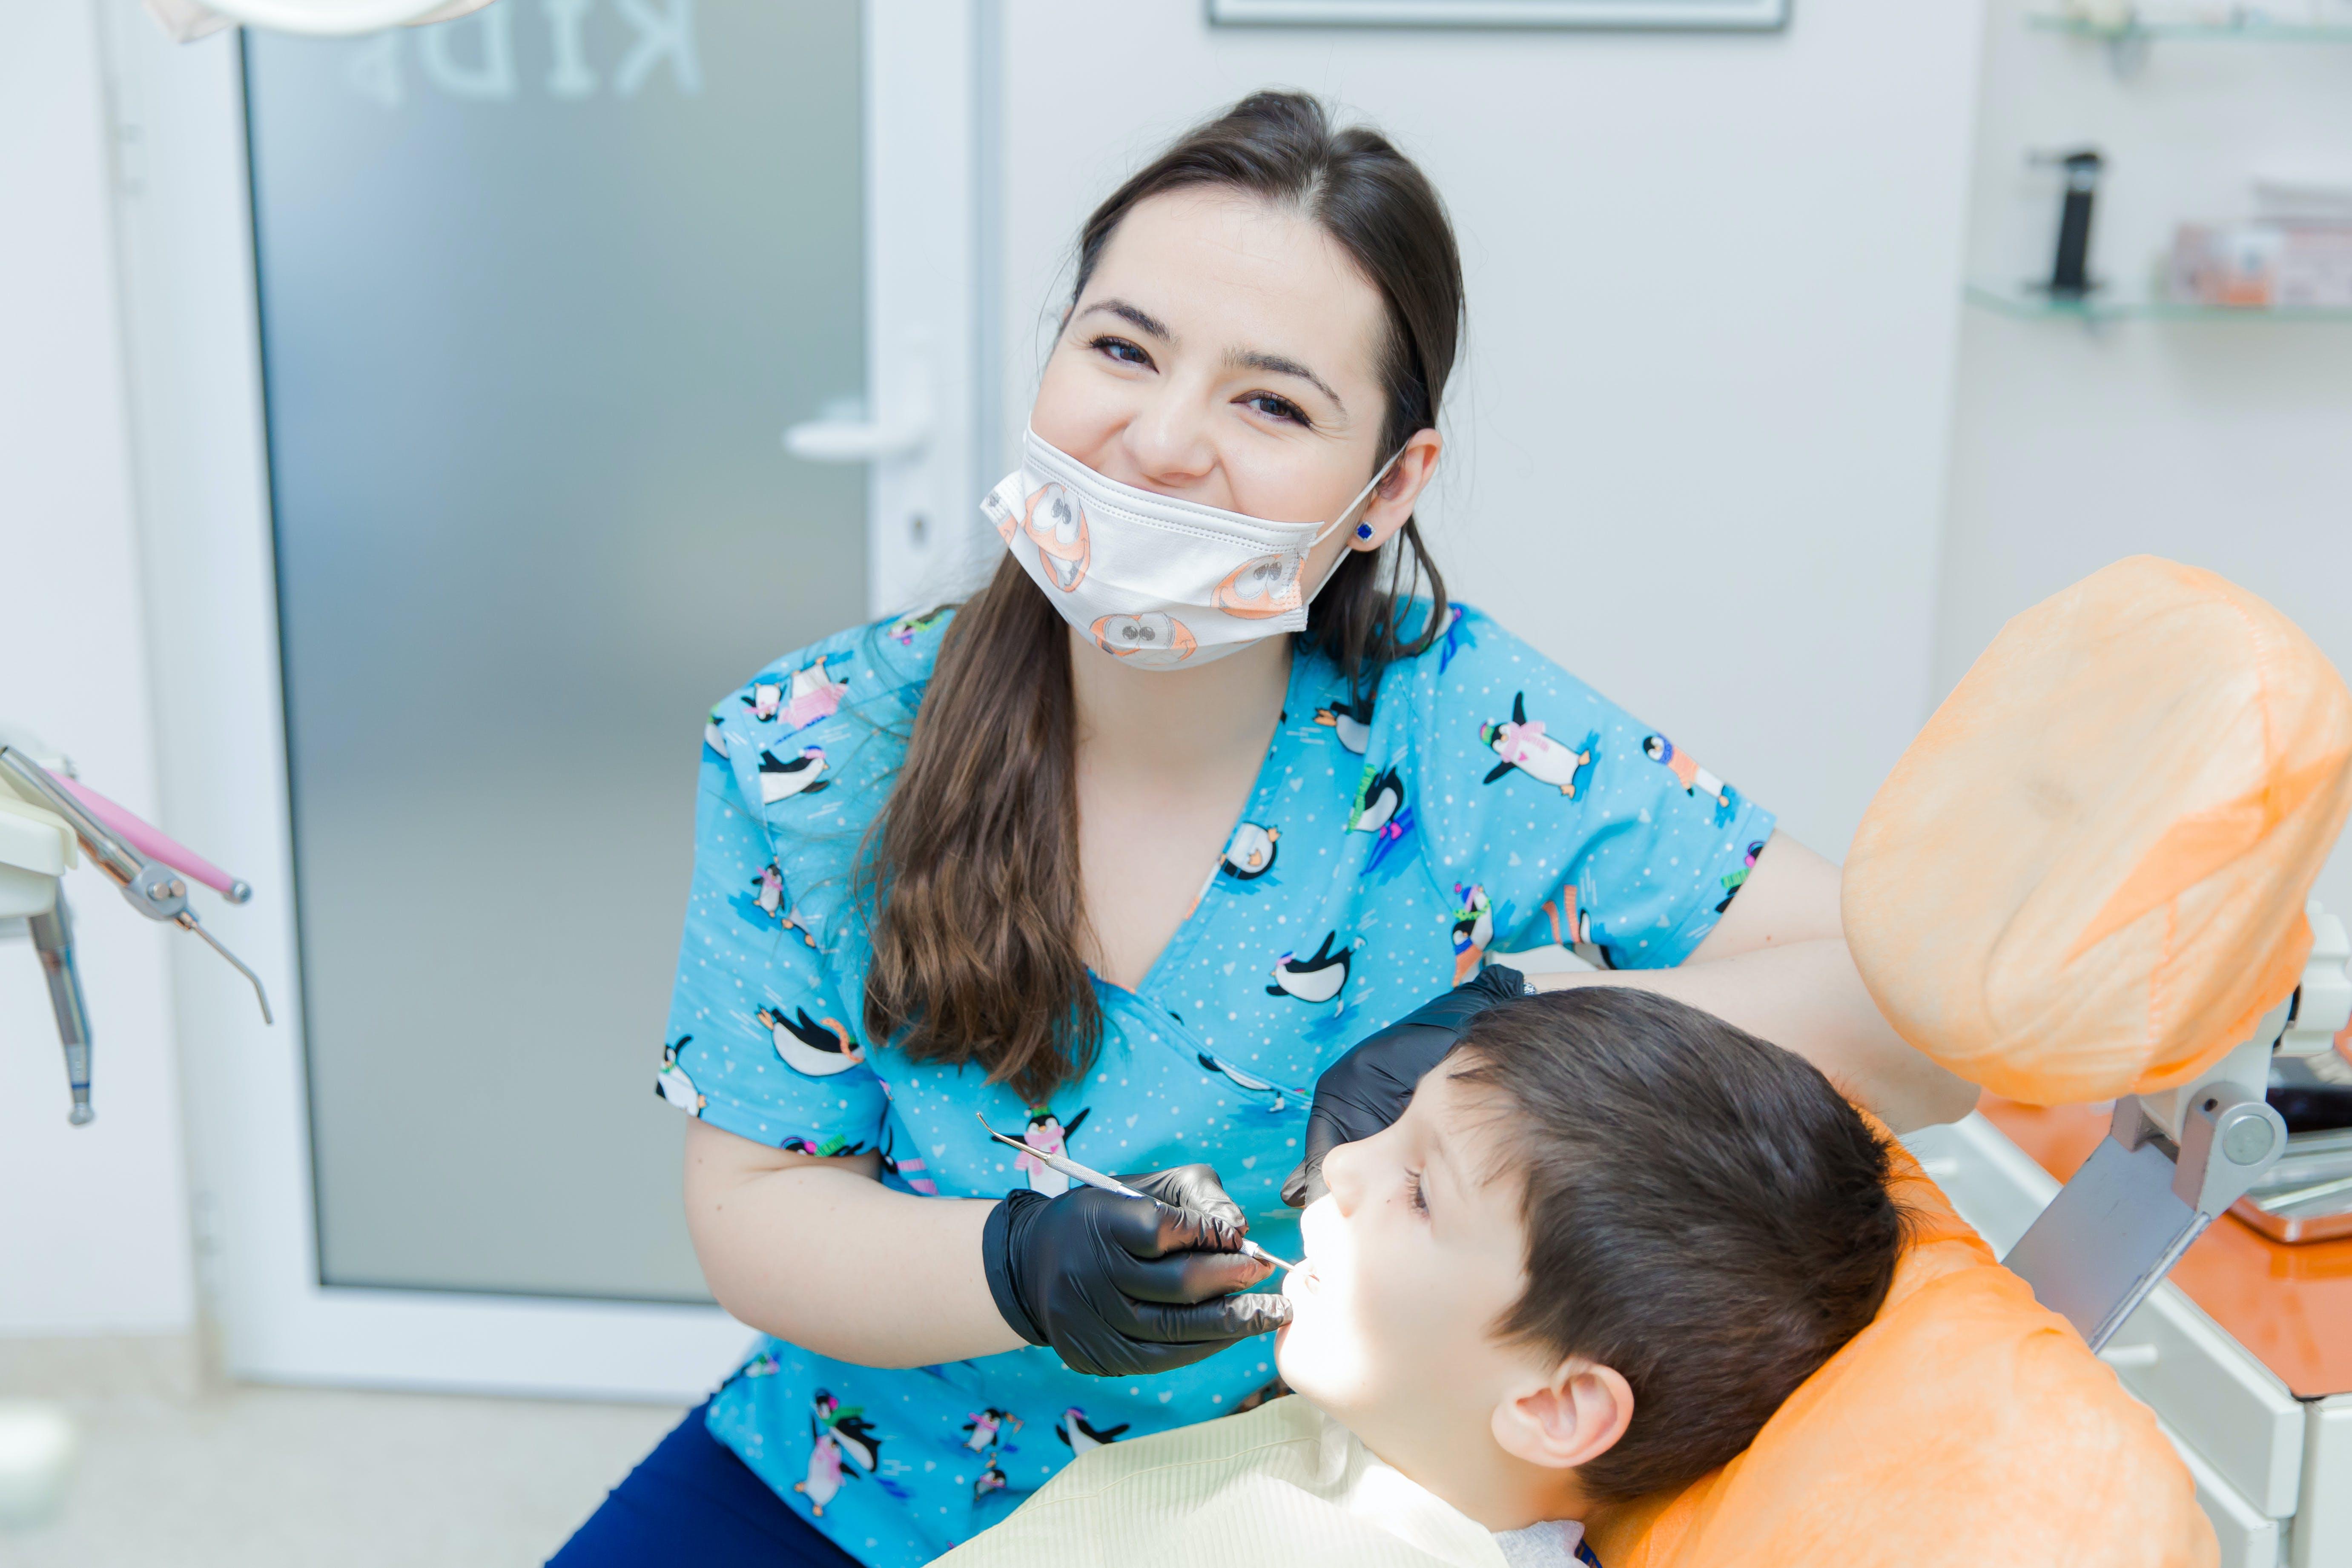 Cabinet stomatologie copii Galați